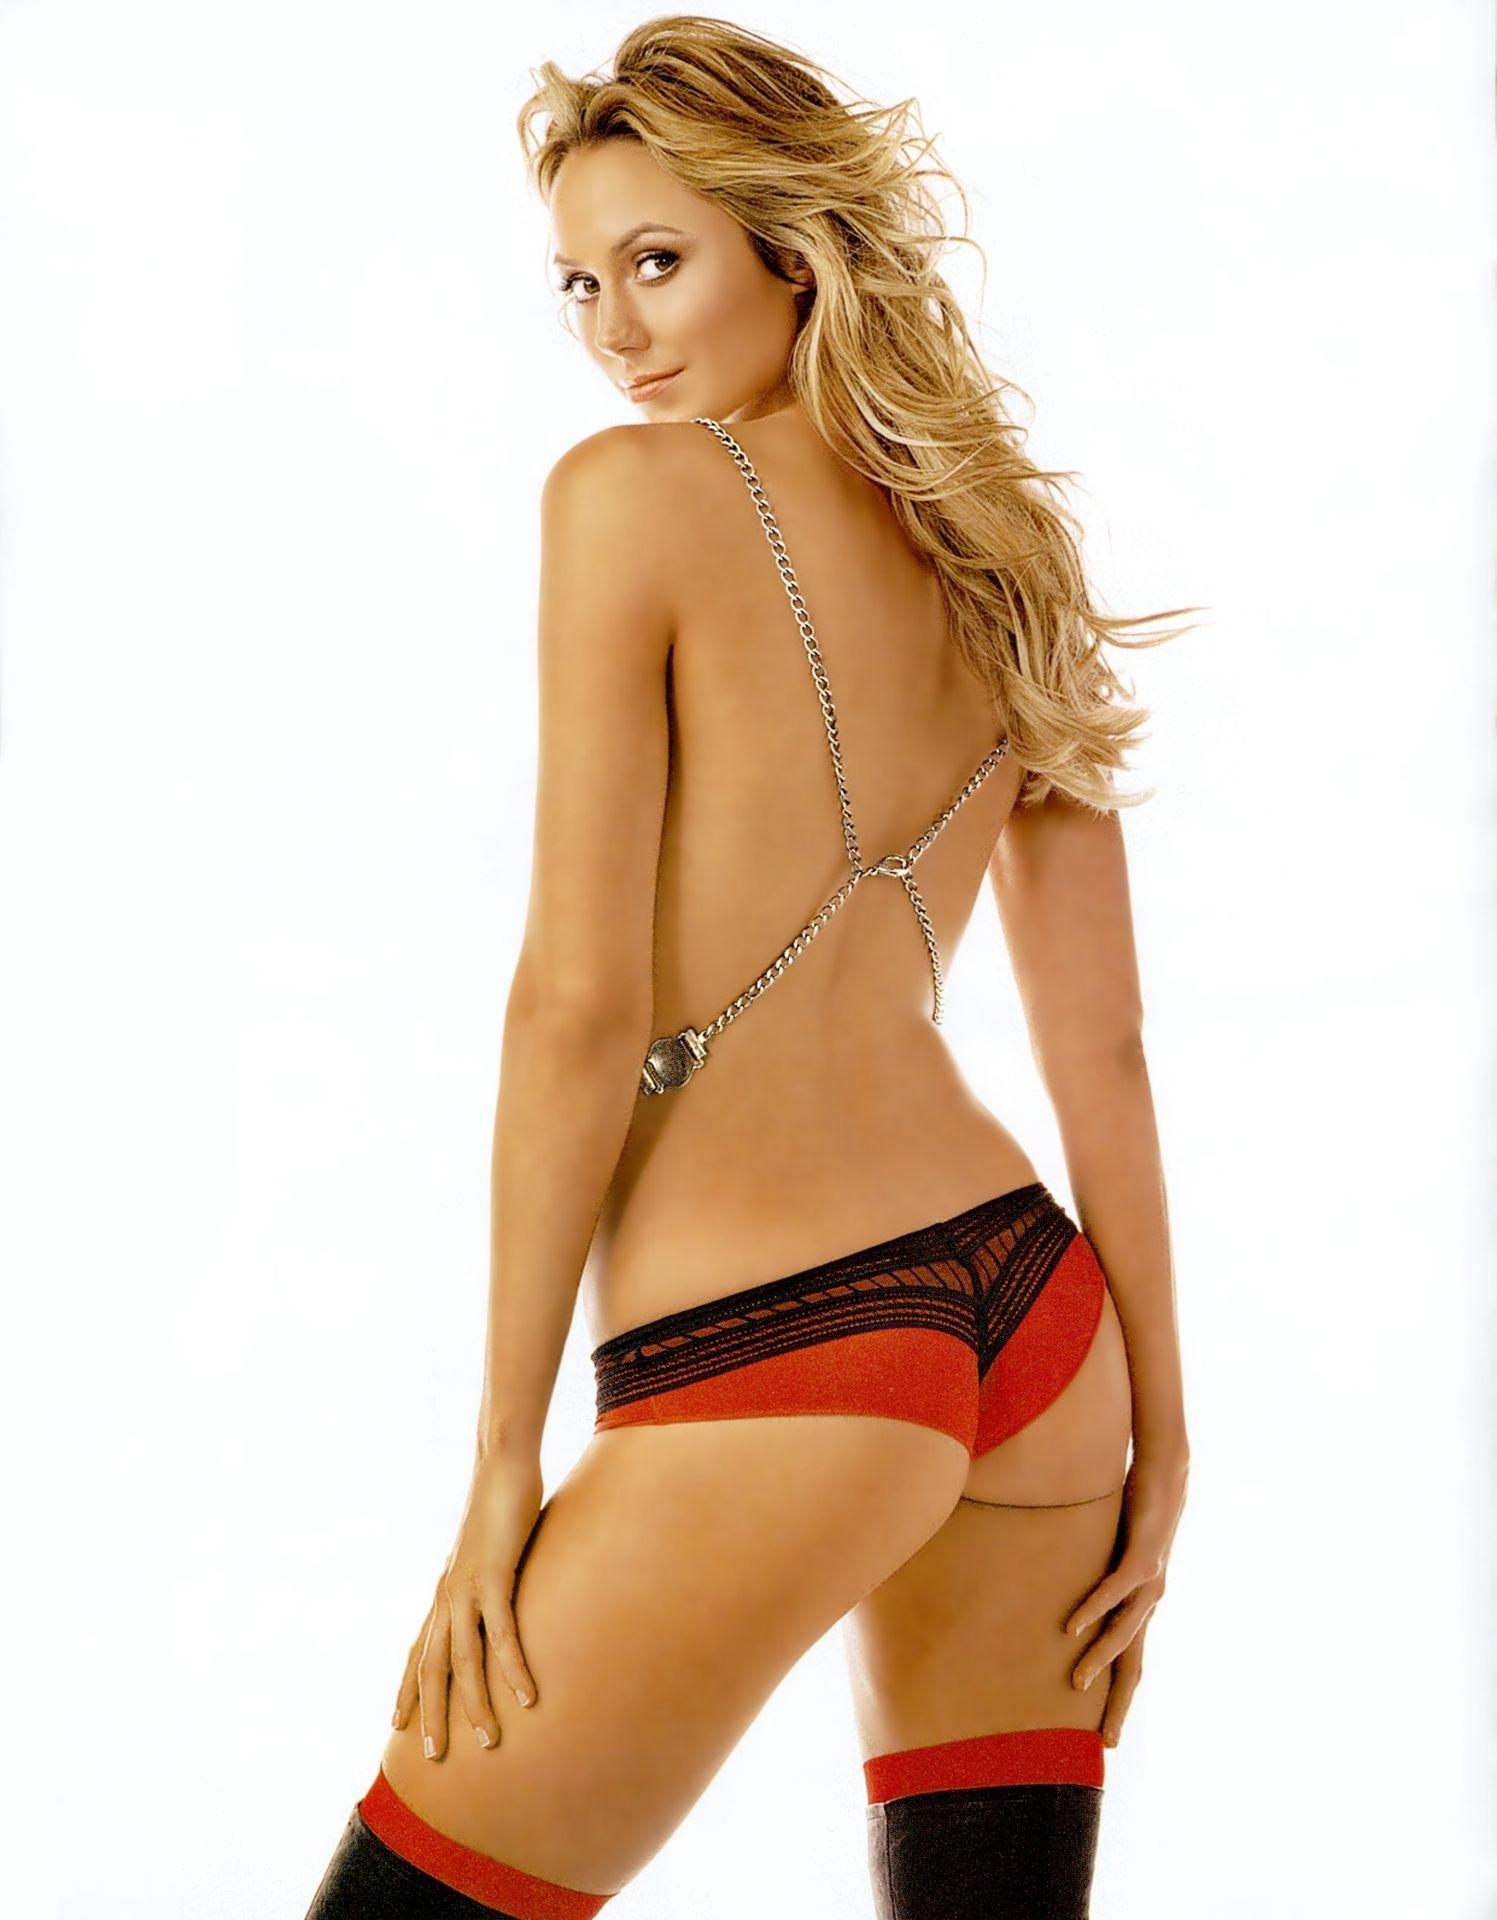 stacy-keibler-nude-sexy-9-thefappeningblog.com_.jpg